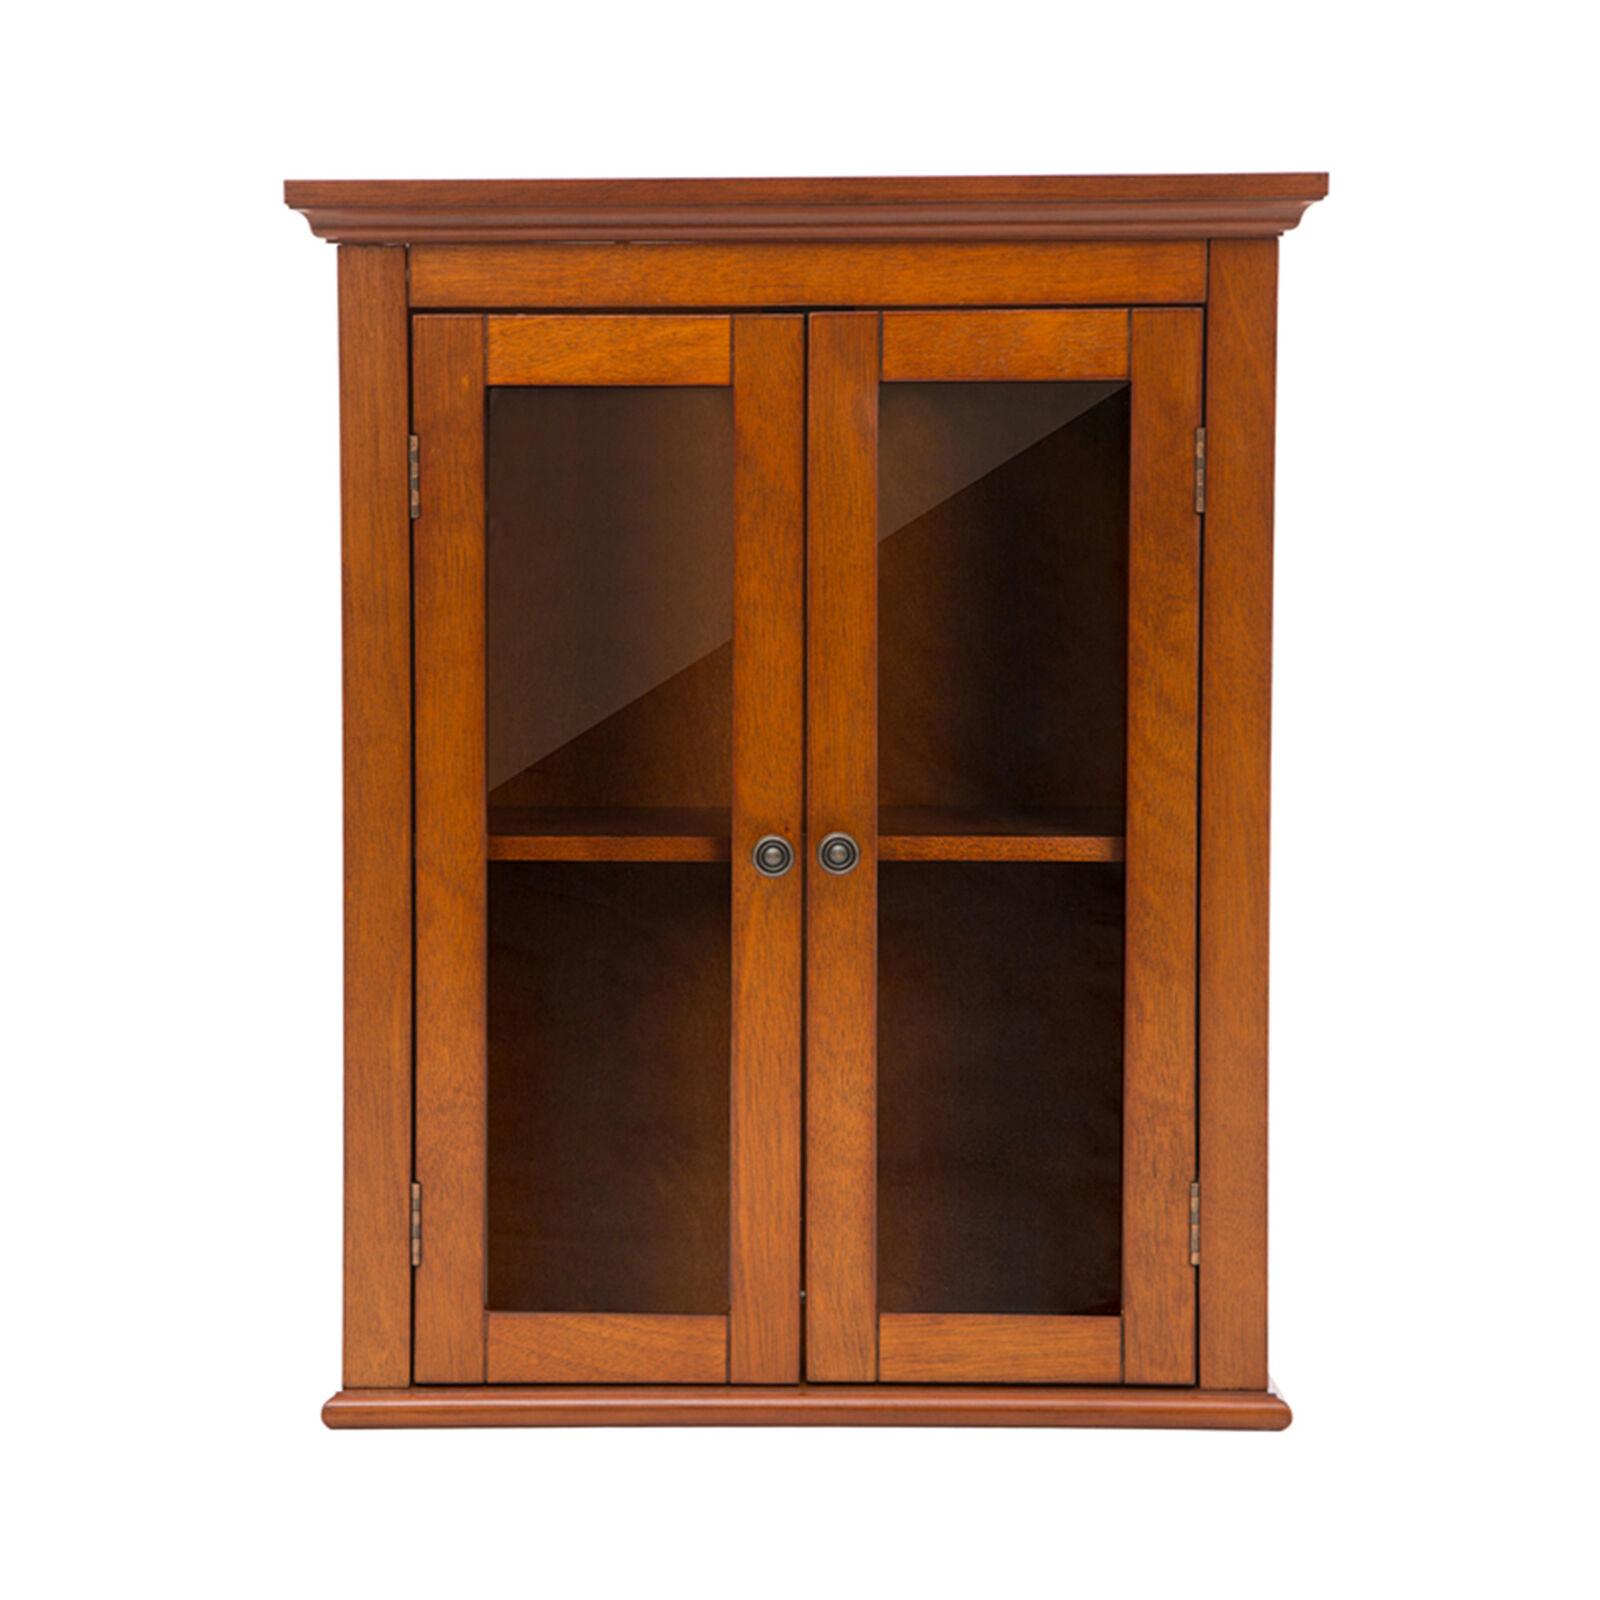 Glitzhome 24 Elegant Wall Mounted Cabinets Shutterglass Door